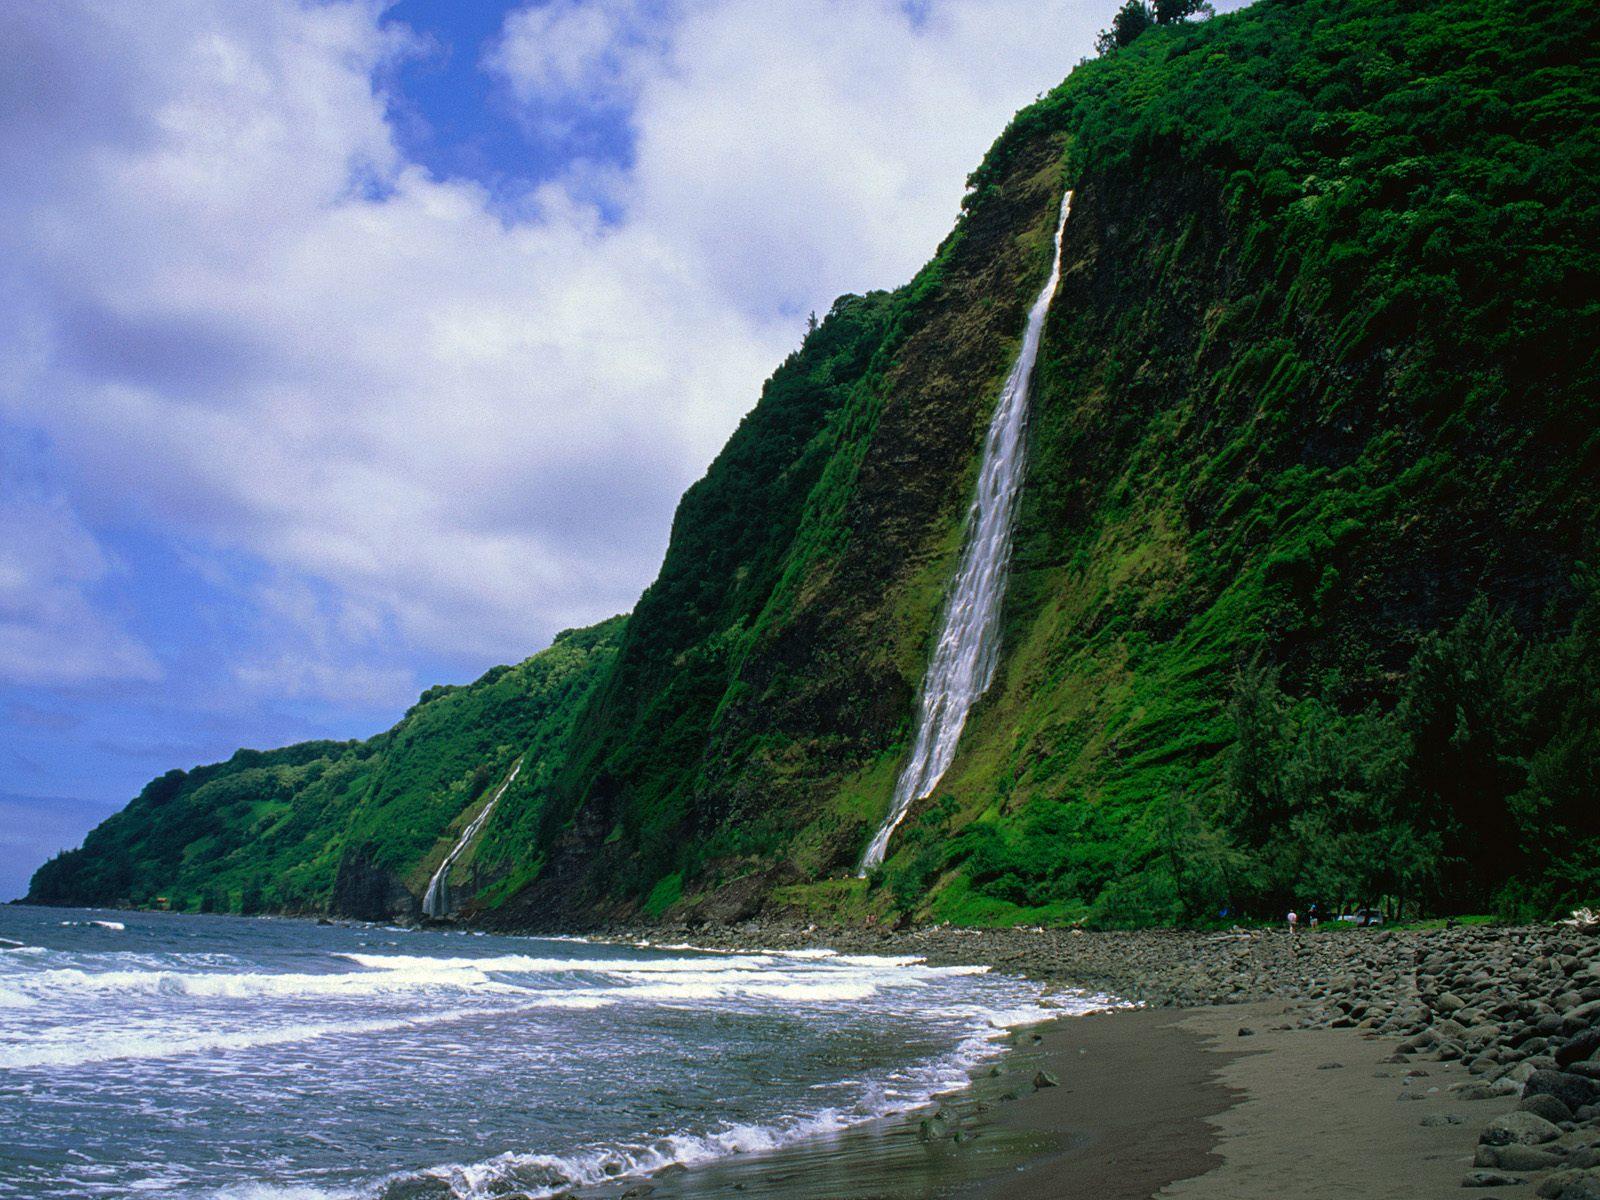 Kaluahine Waterfall, Waipio Valley, Hamakua Coast, Hawaii